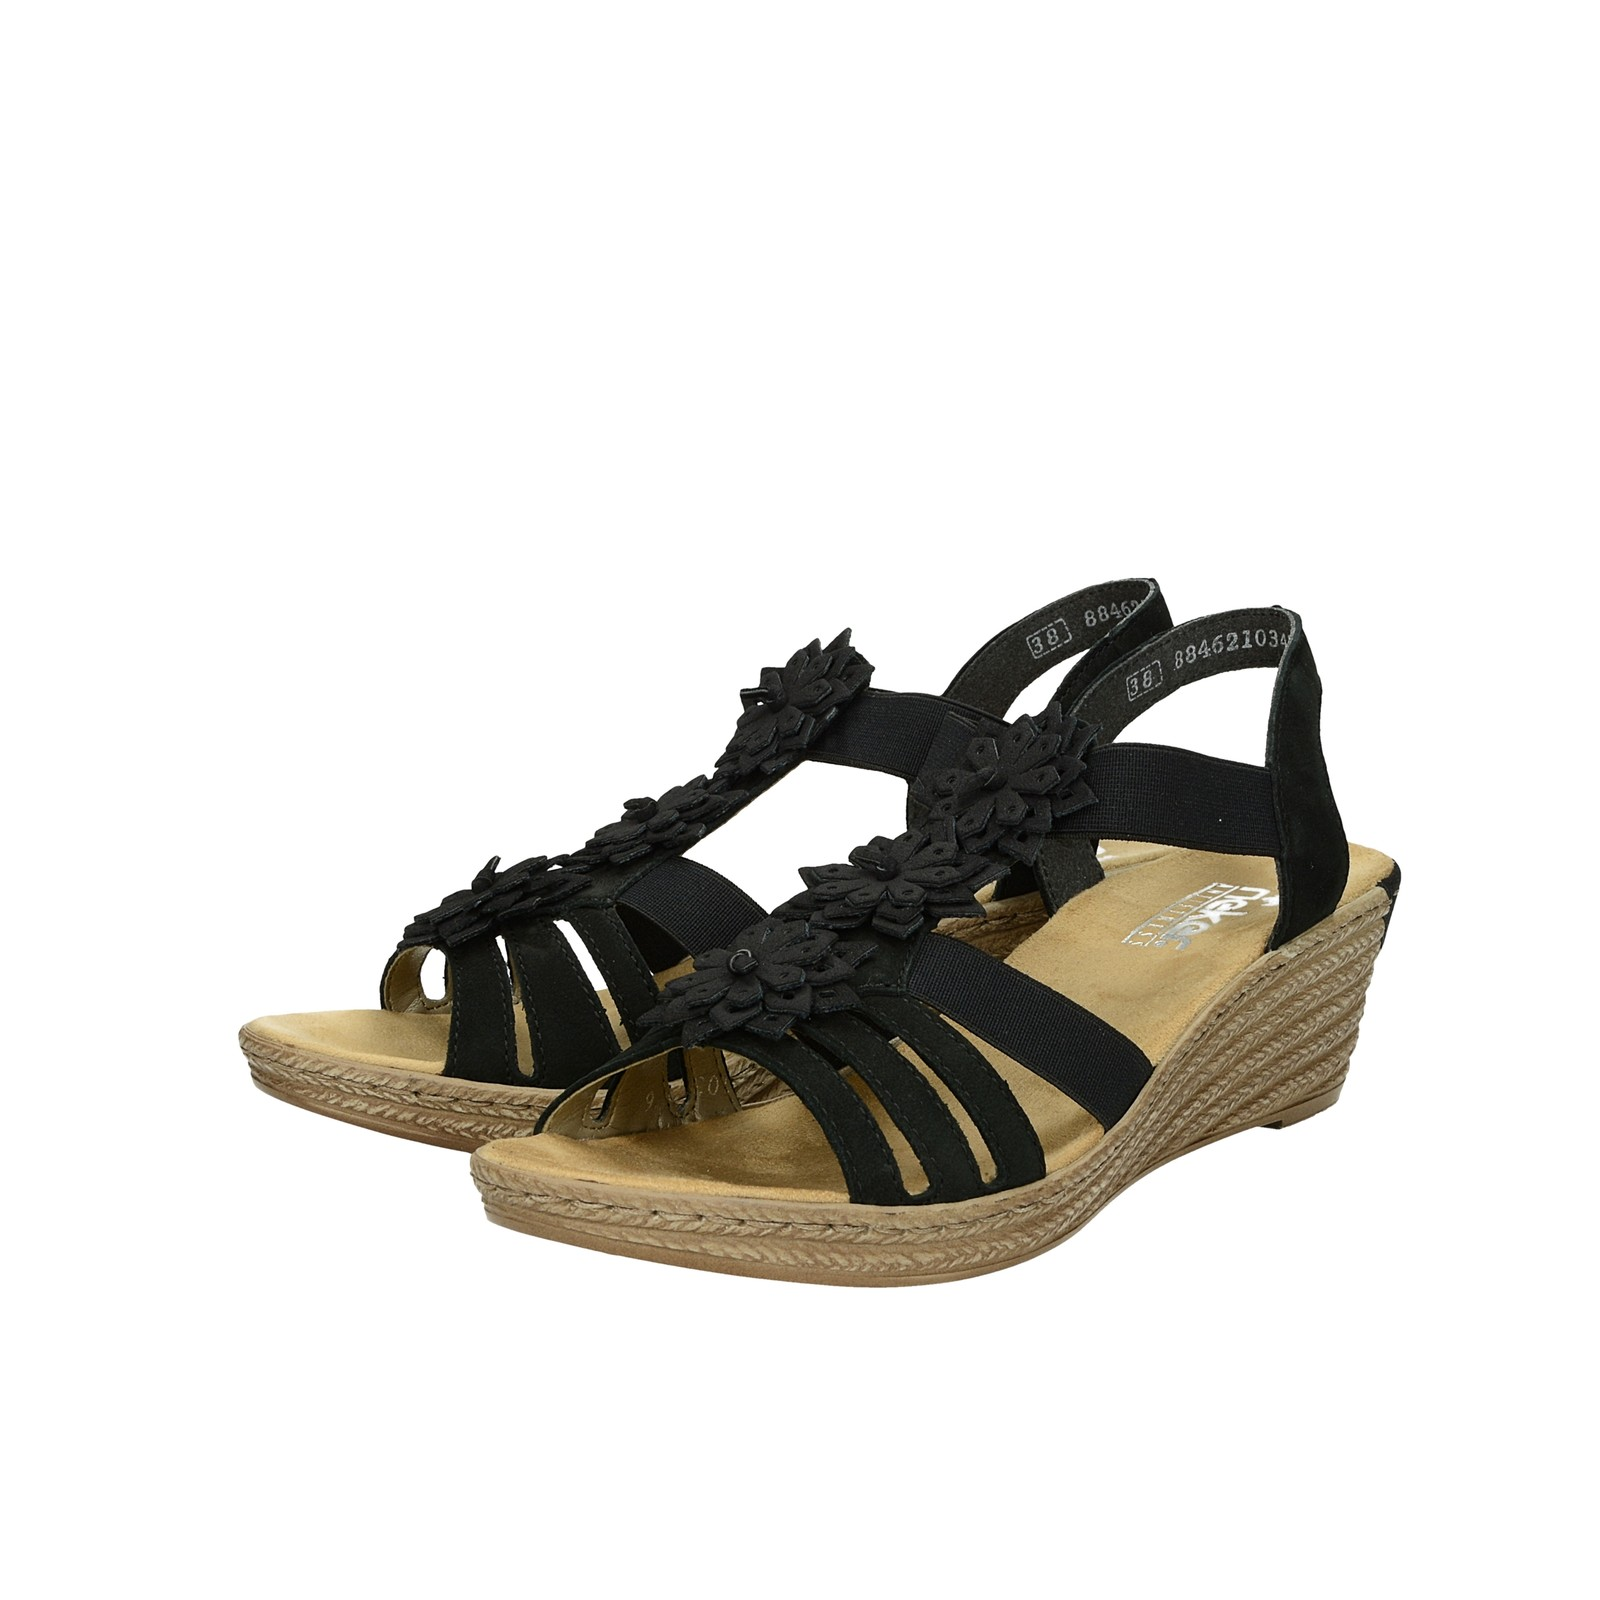 1af8f9cc2150 Rieker dámske pohodlné sandále na klinovej podrážke - čierne ...